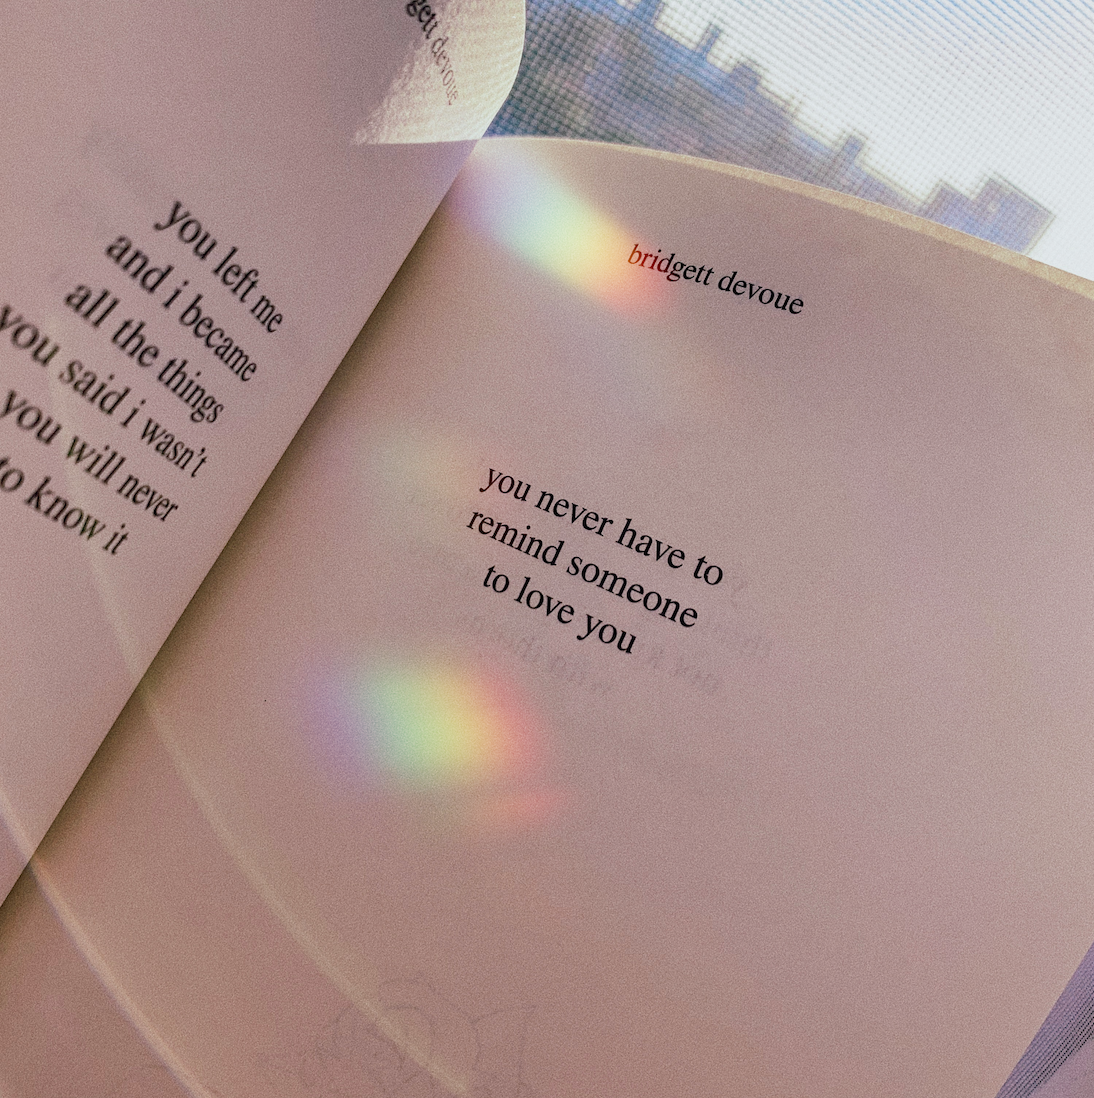 Bridgett Devoue Book Quotes Words Quotes Poetry Books